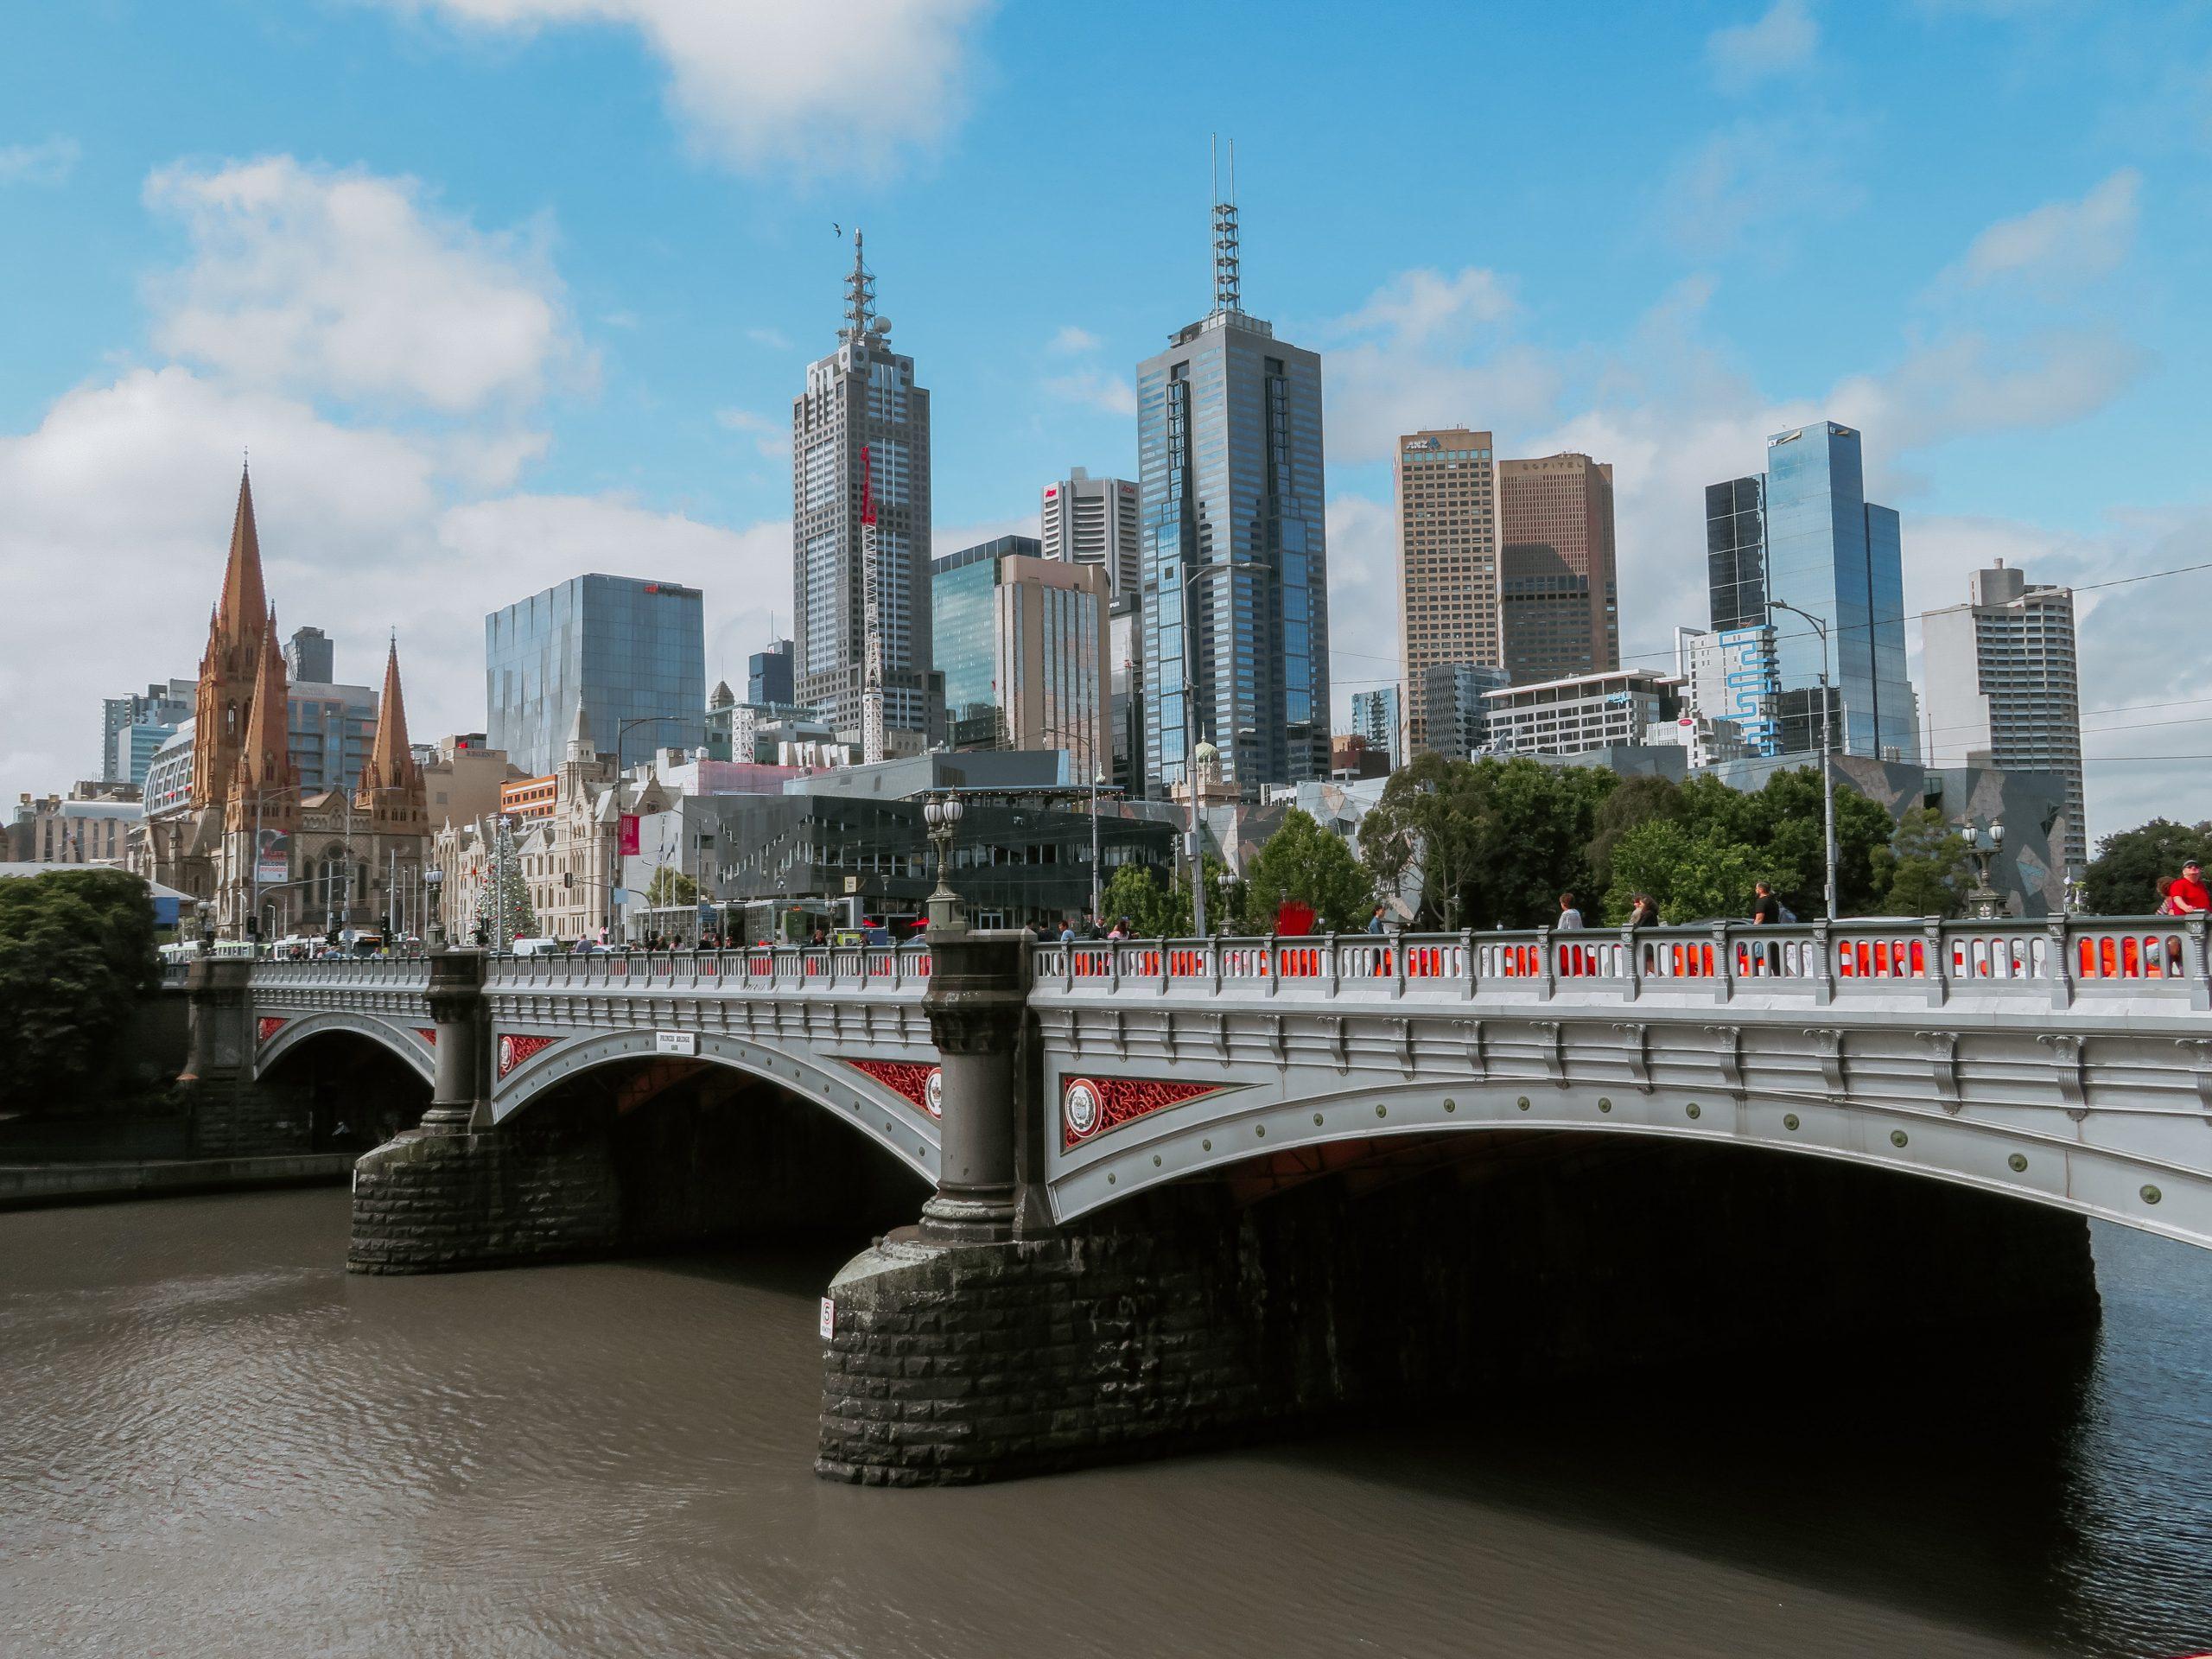 Melbourne airport to city center, Melbourne airport to city, How To Get From Melbourne Airport To City Center